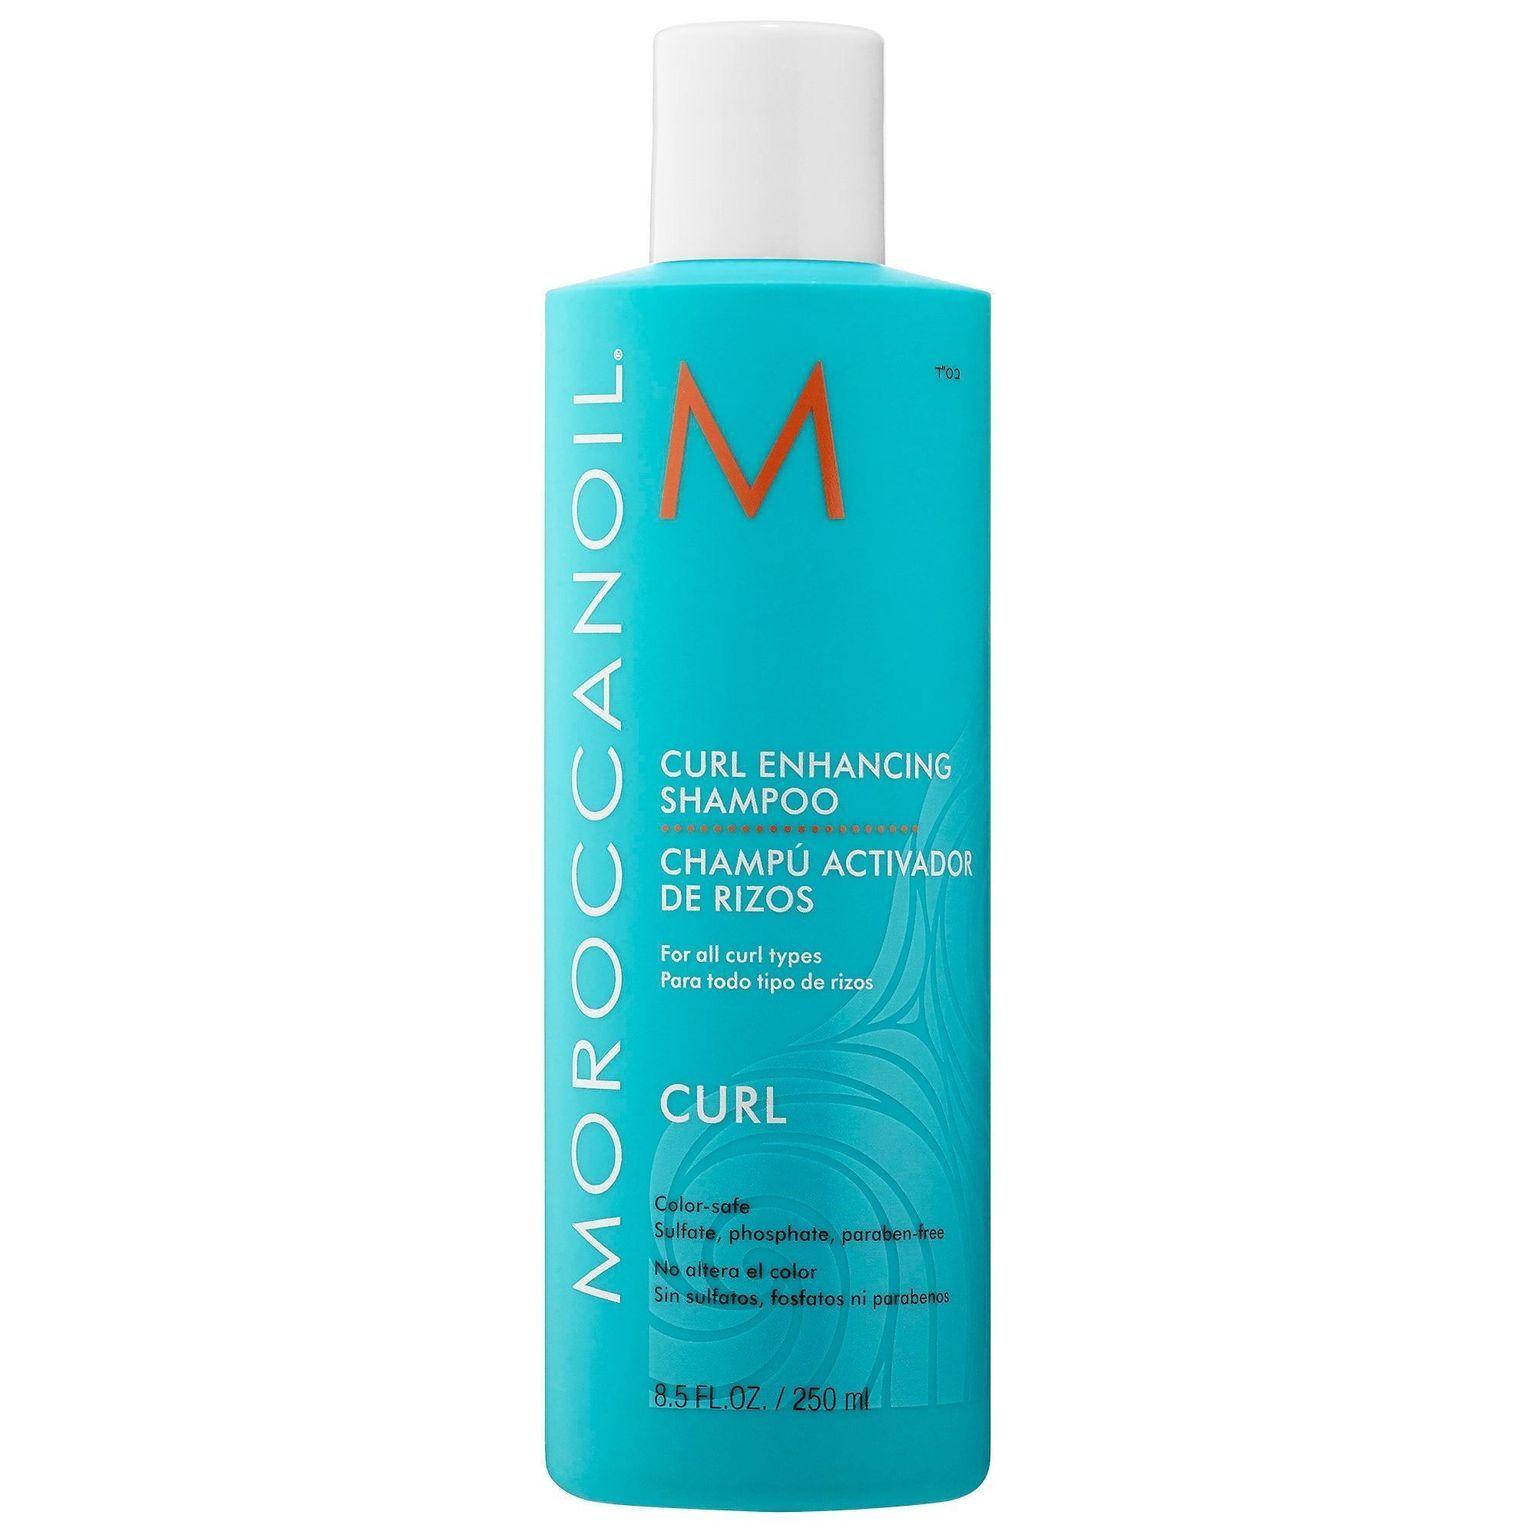 Curl Enhancing Shampoo